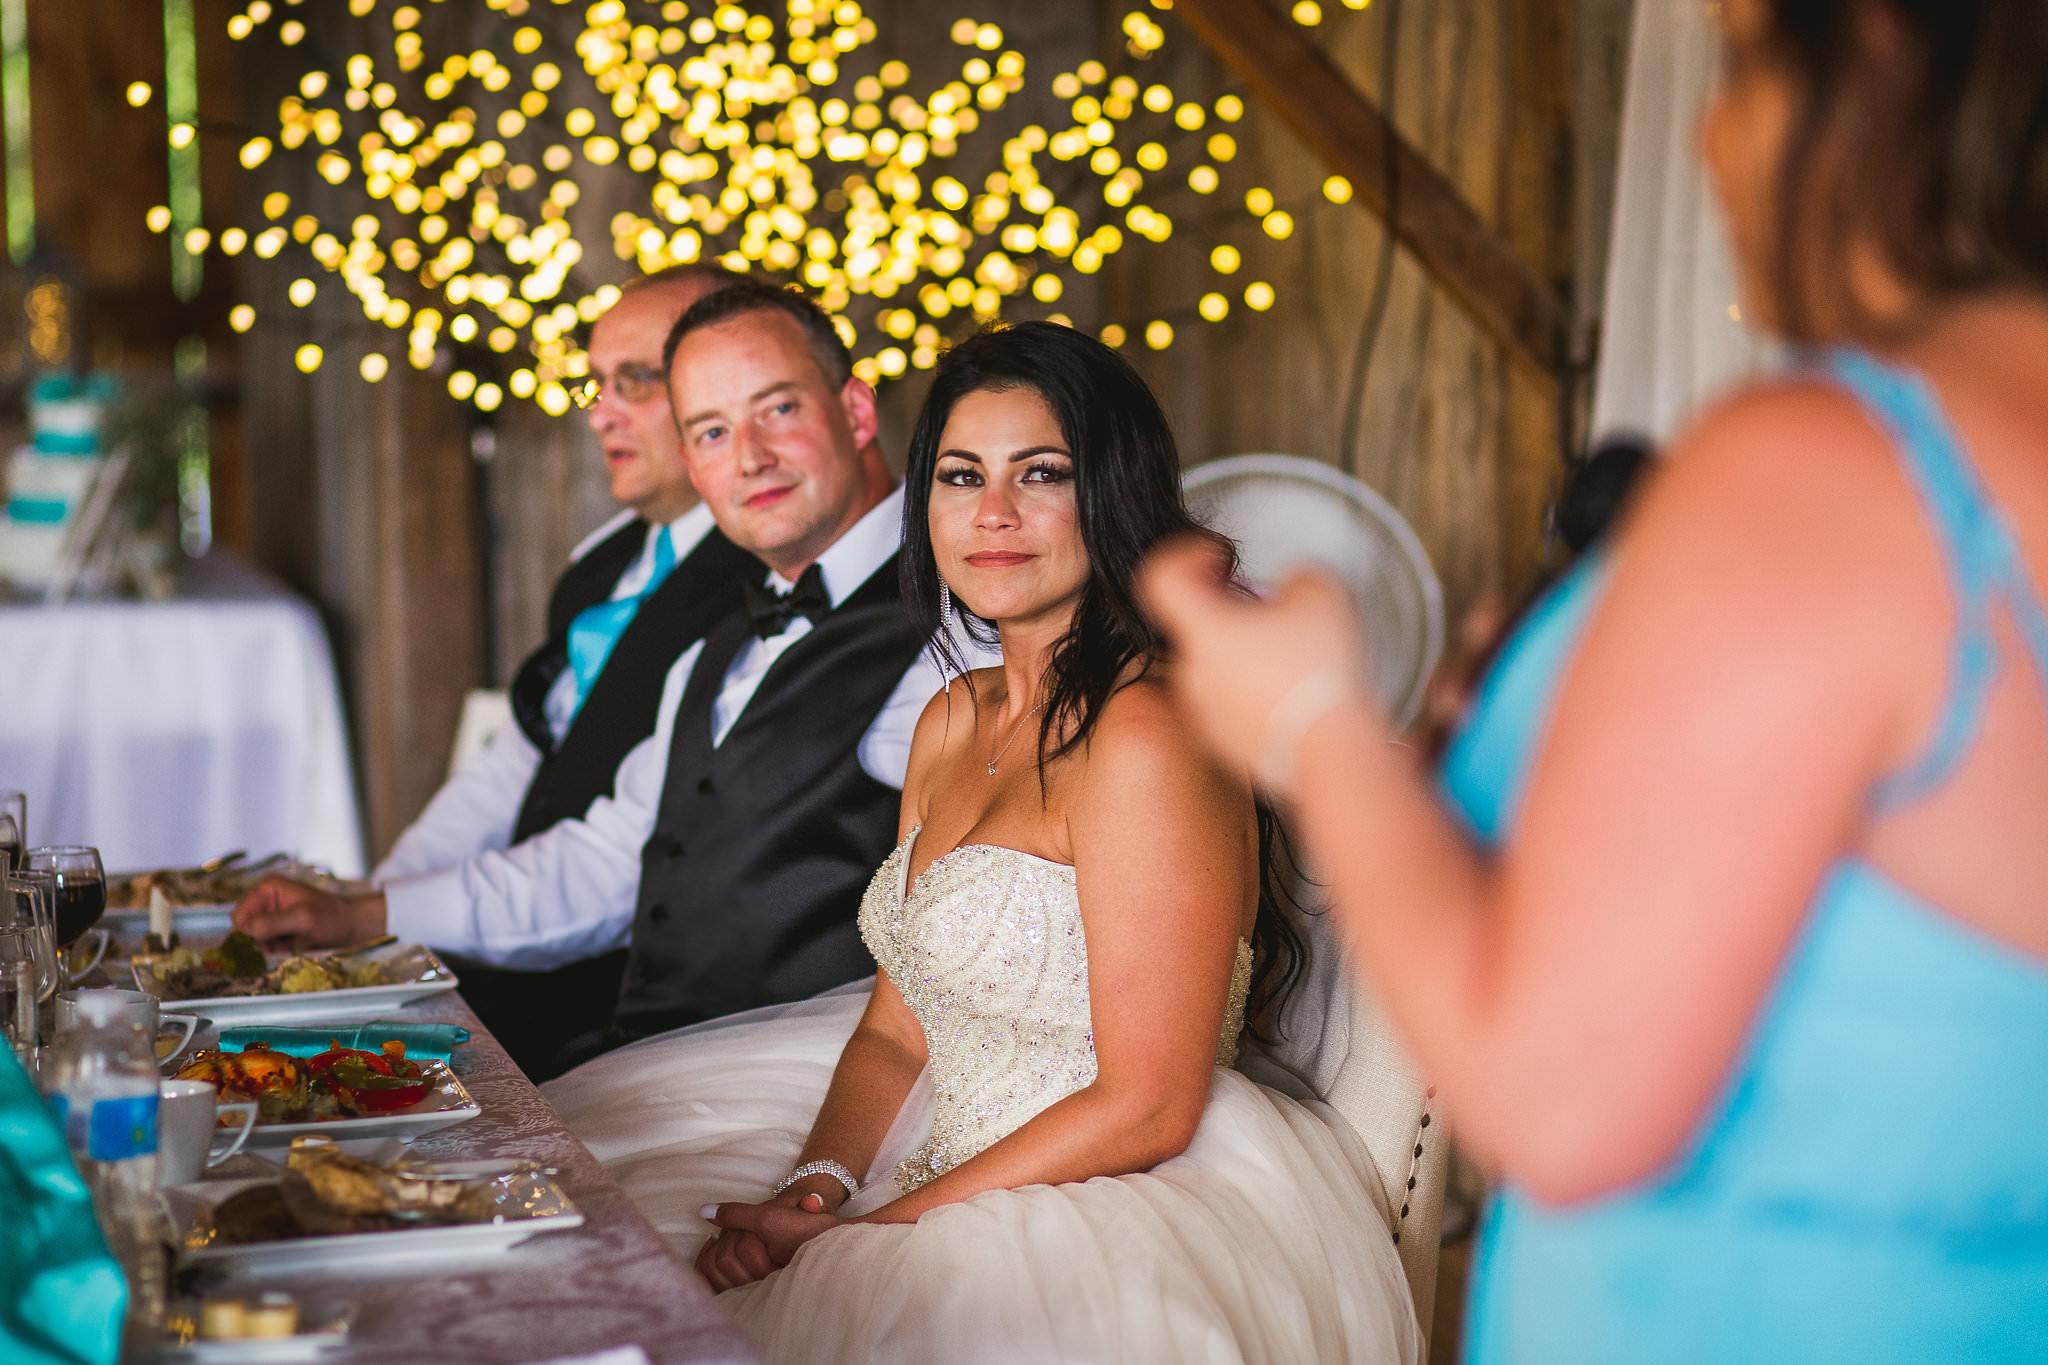 wedding reception at stoneacre farm